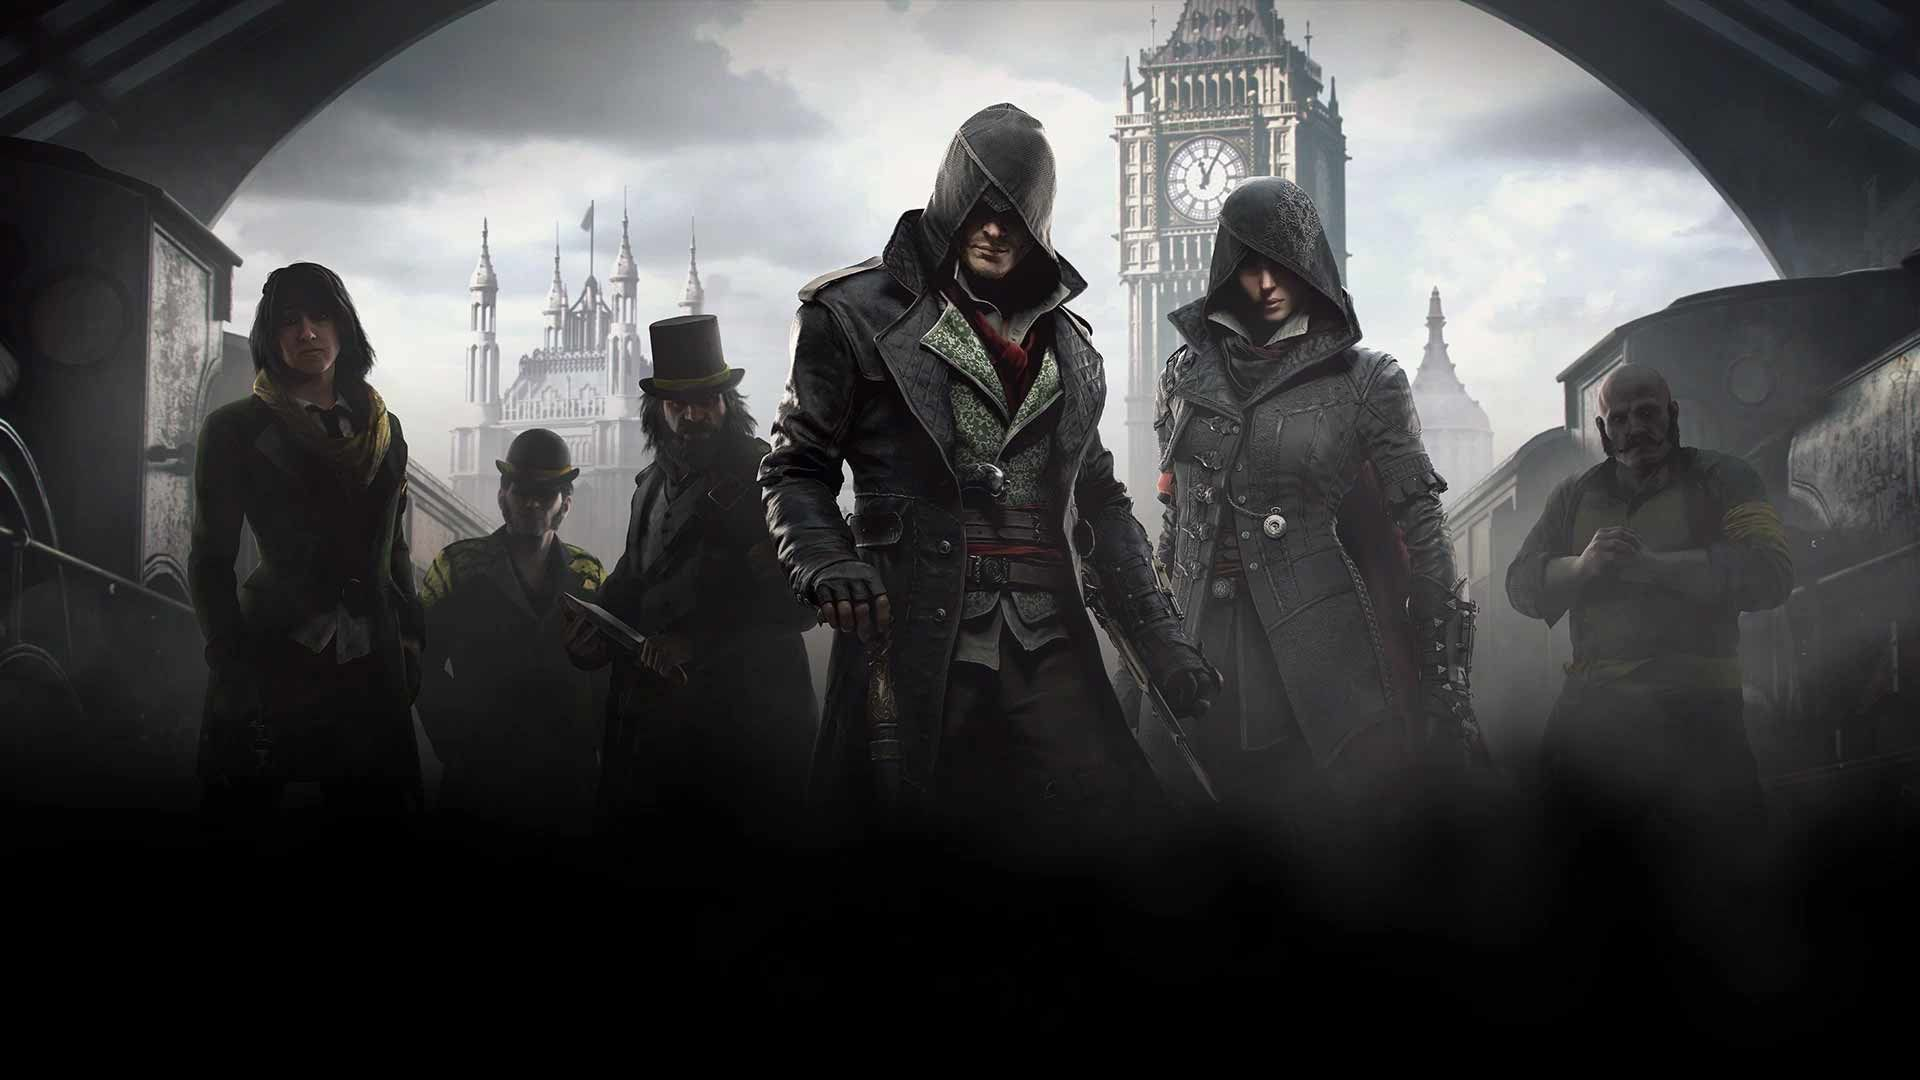 1920x1080 Assassins Creed Syndicate Game Wallpaper Assassins